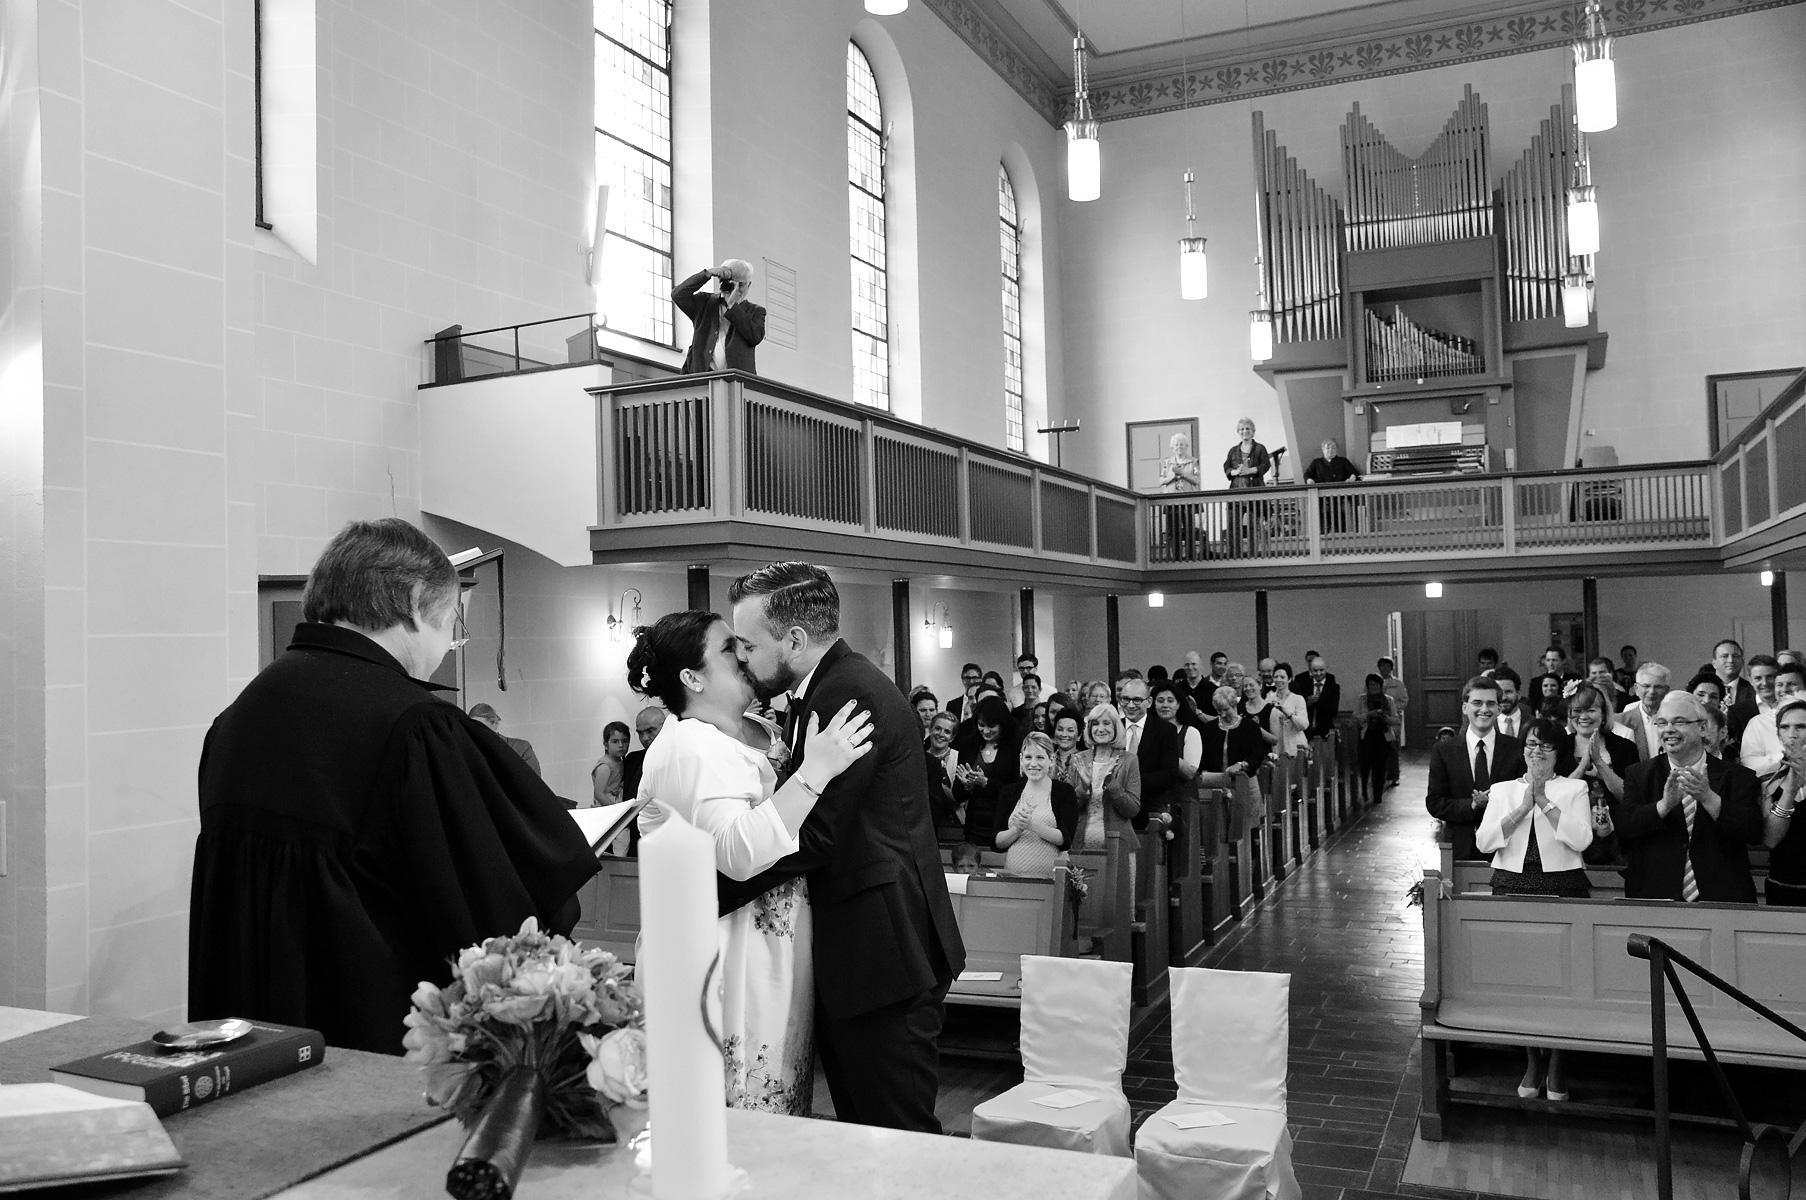 Hochzeitsreportage-Nicole-Bouillon_Nicole-Bouillon-Fotografie142